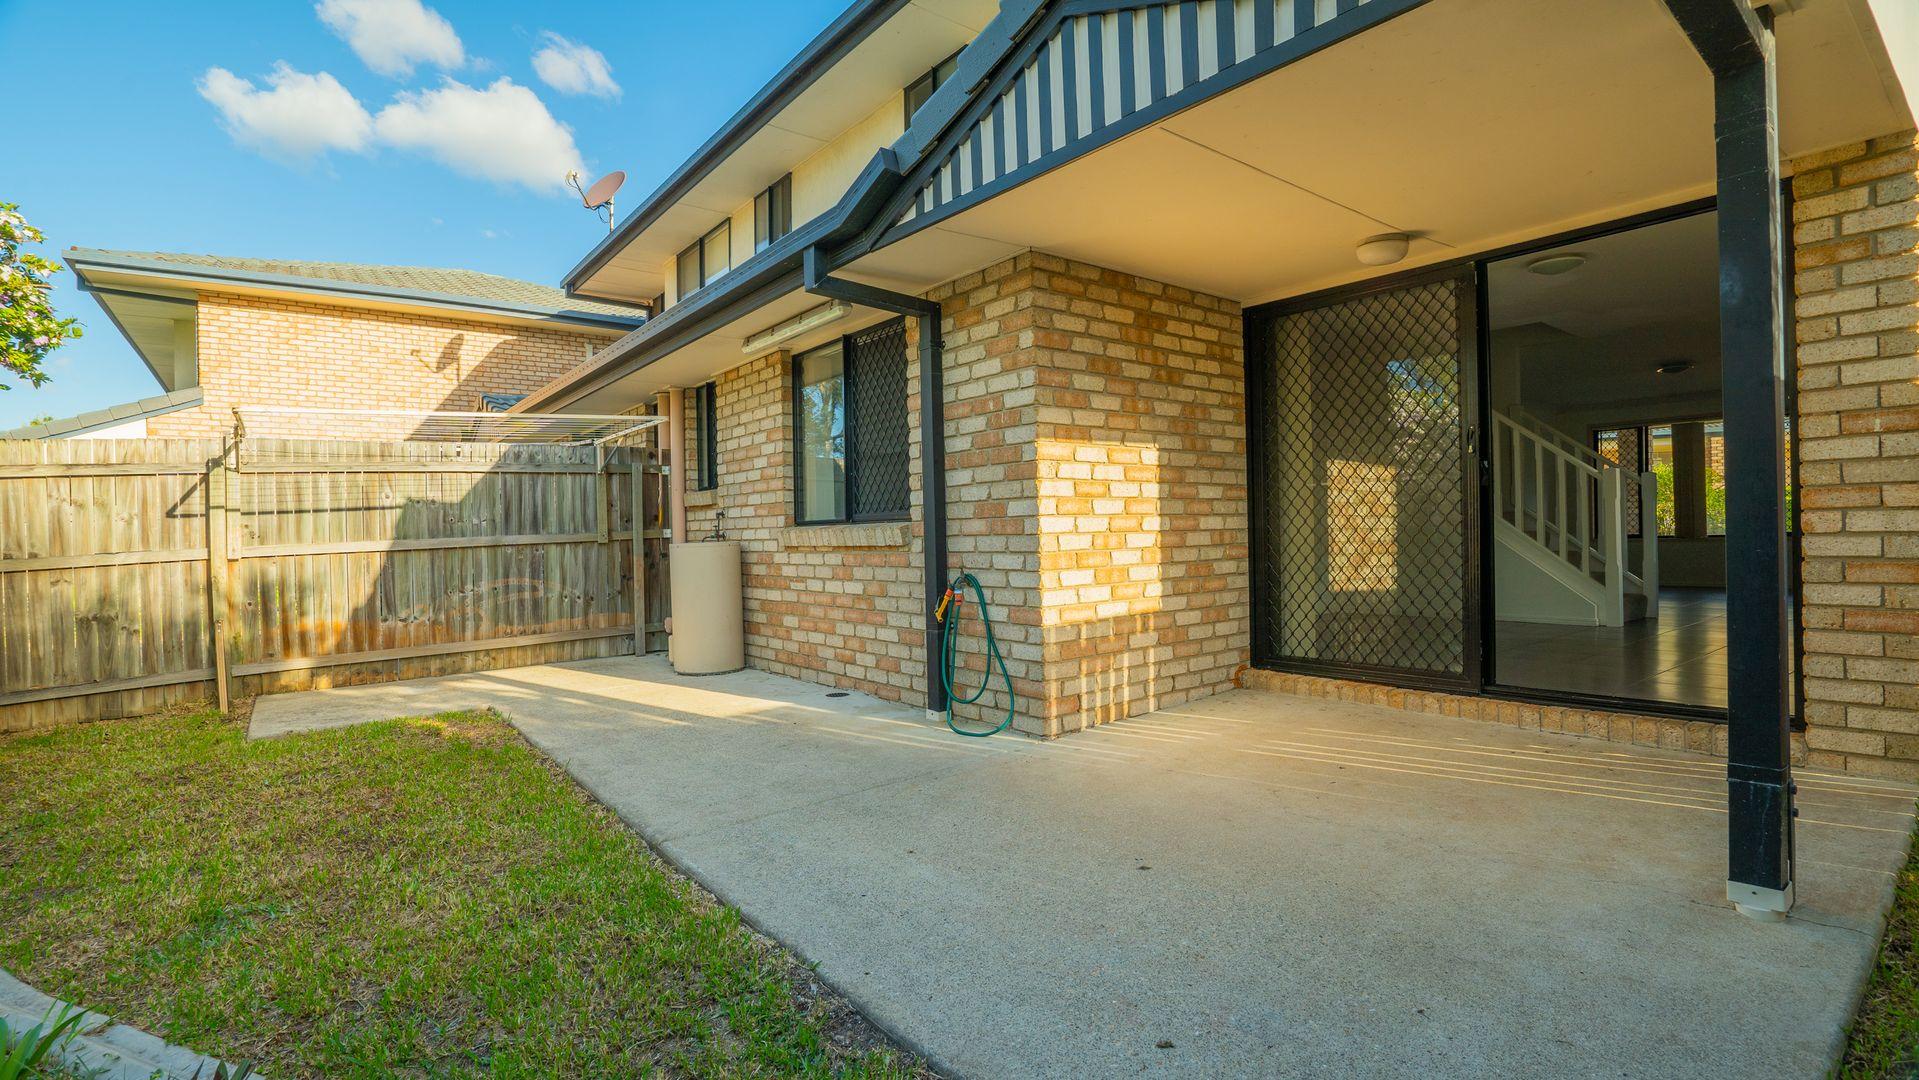 3/50 Endeavour Street, Mount Ommaney QLD 4074, Image 1